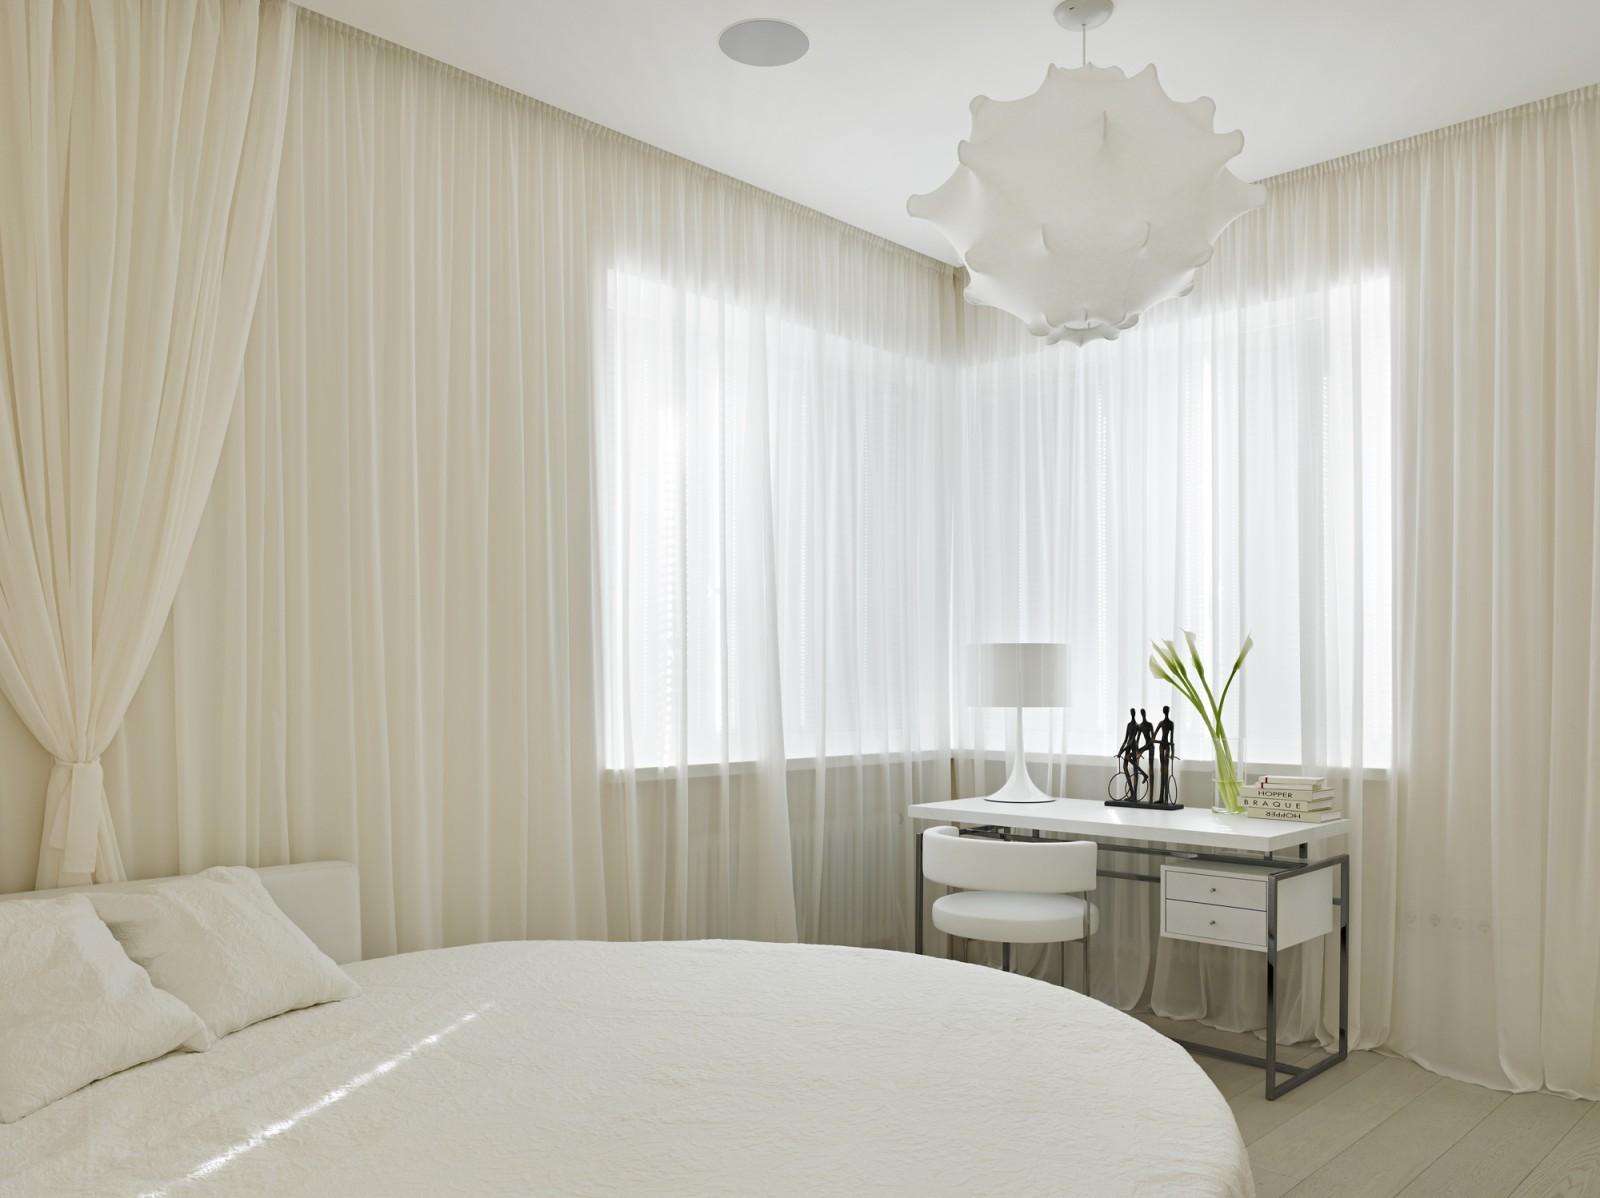 Nice villa interior by architectural Bureau of Alexandra Fedorova - 18